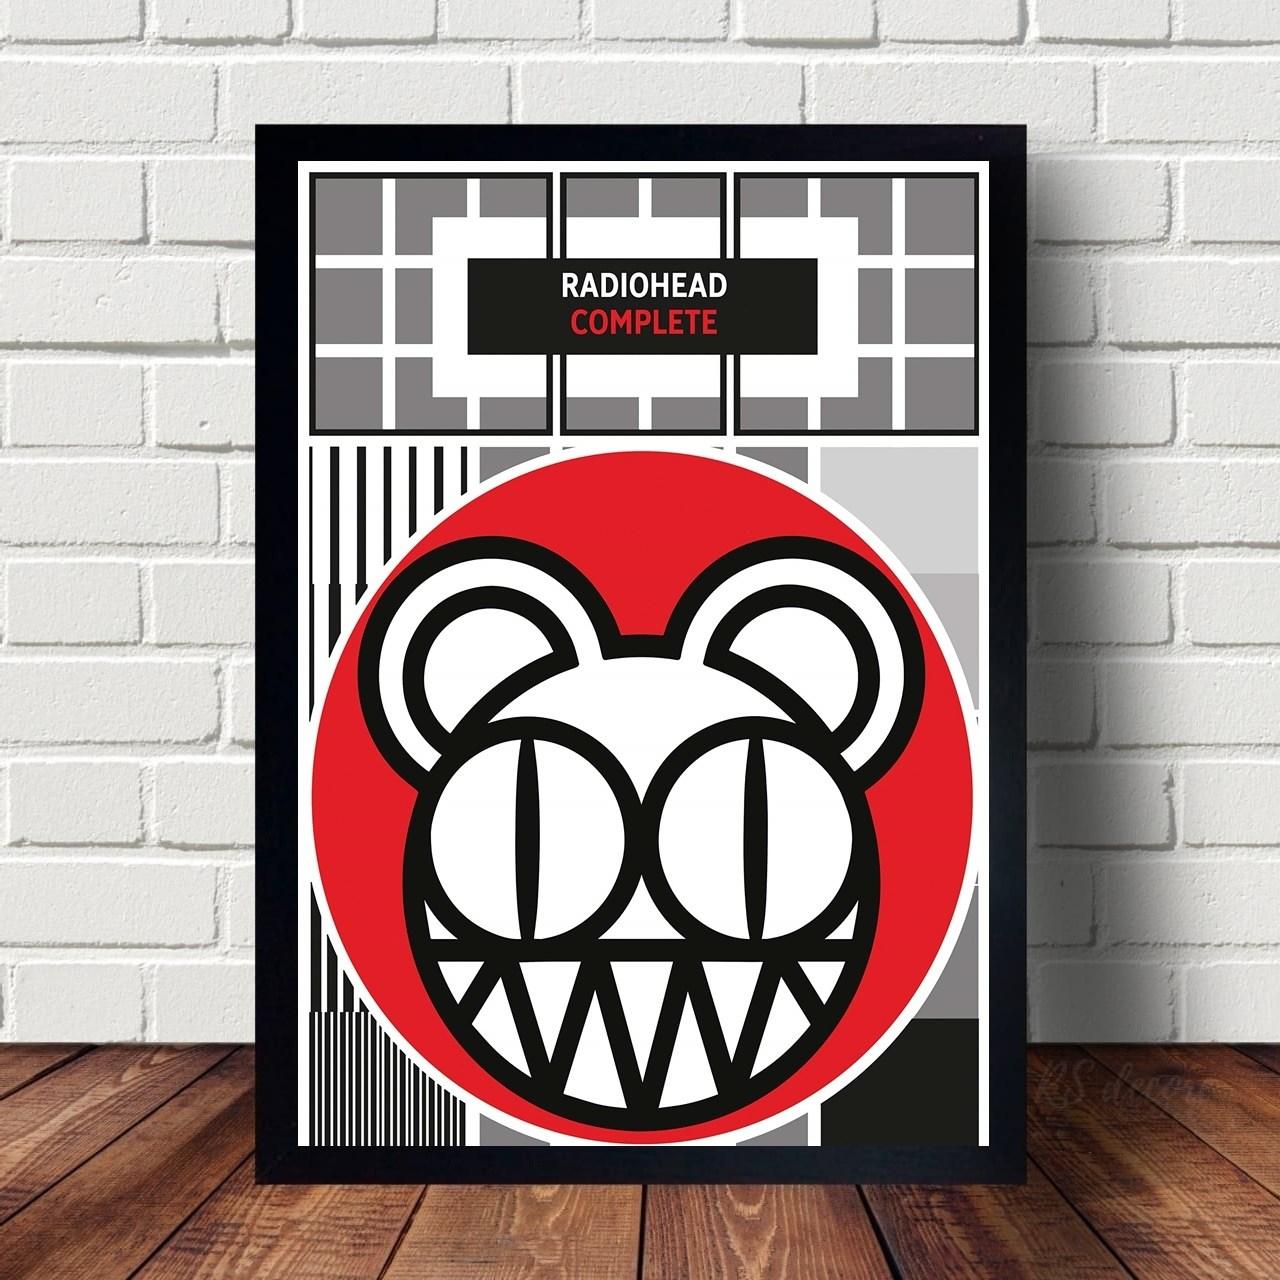 Quadro Decorativo Radiohead V